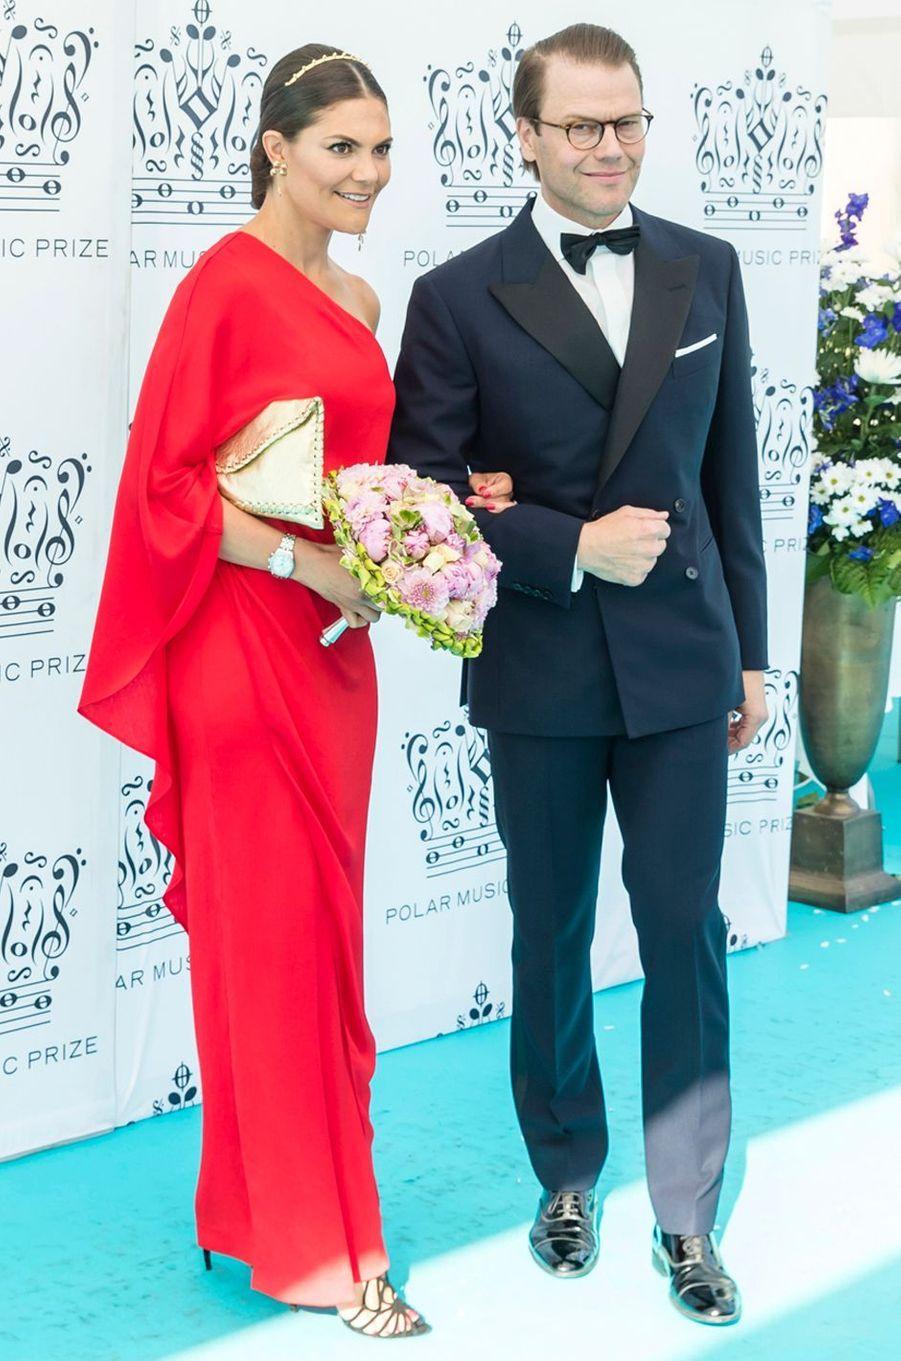 La princesse Victoria de Suède le 14 juin 2018